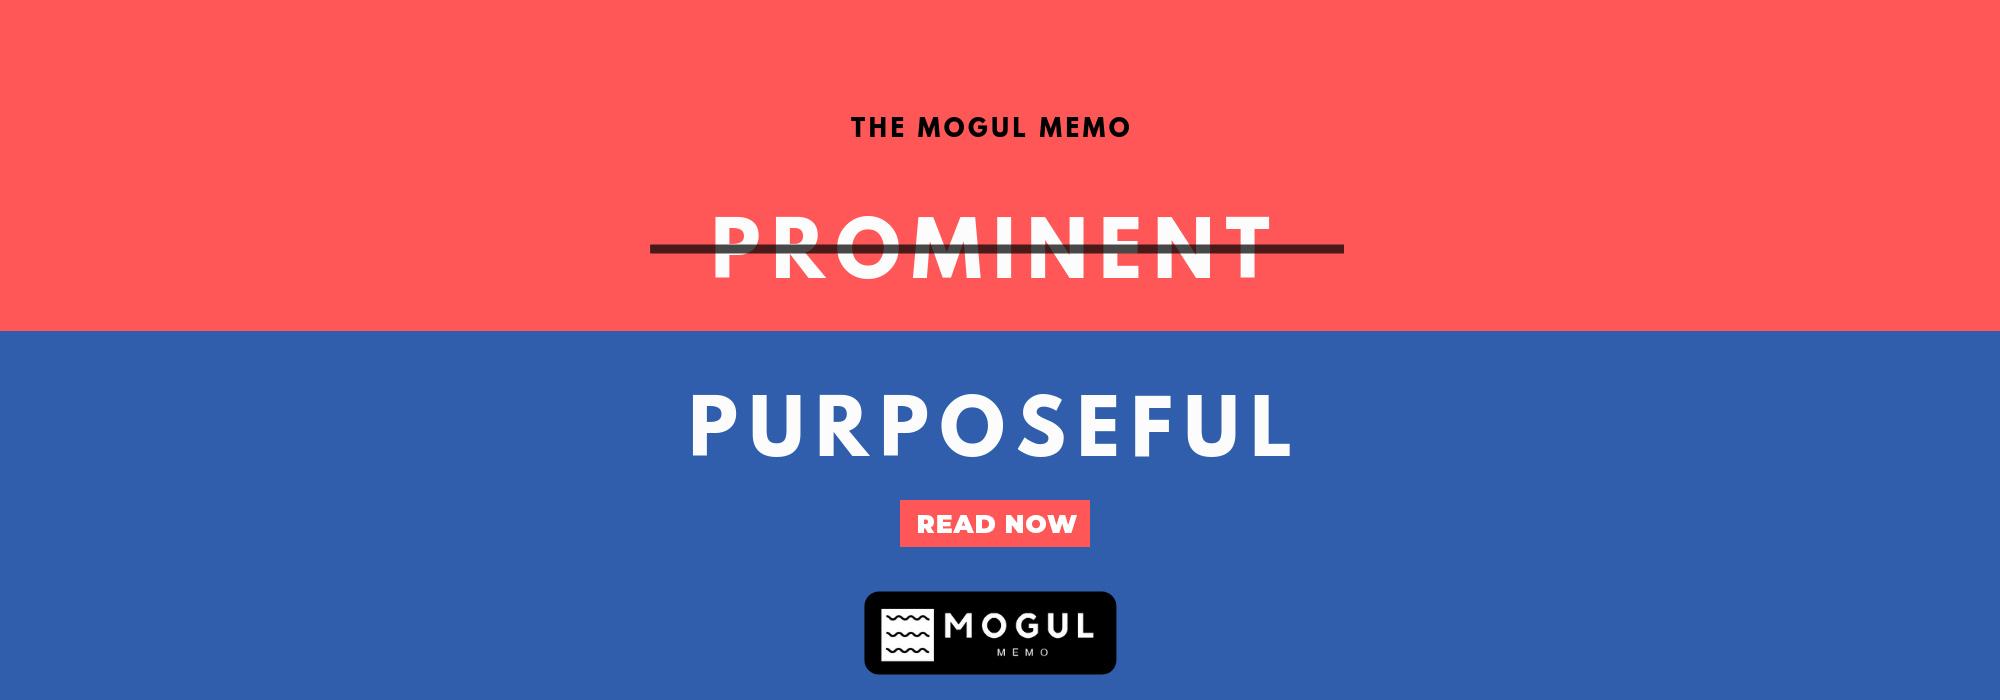 Purposeful Blog Header.jpg